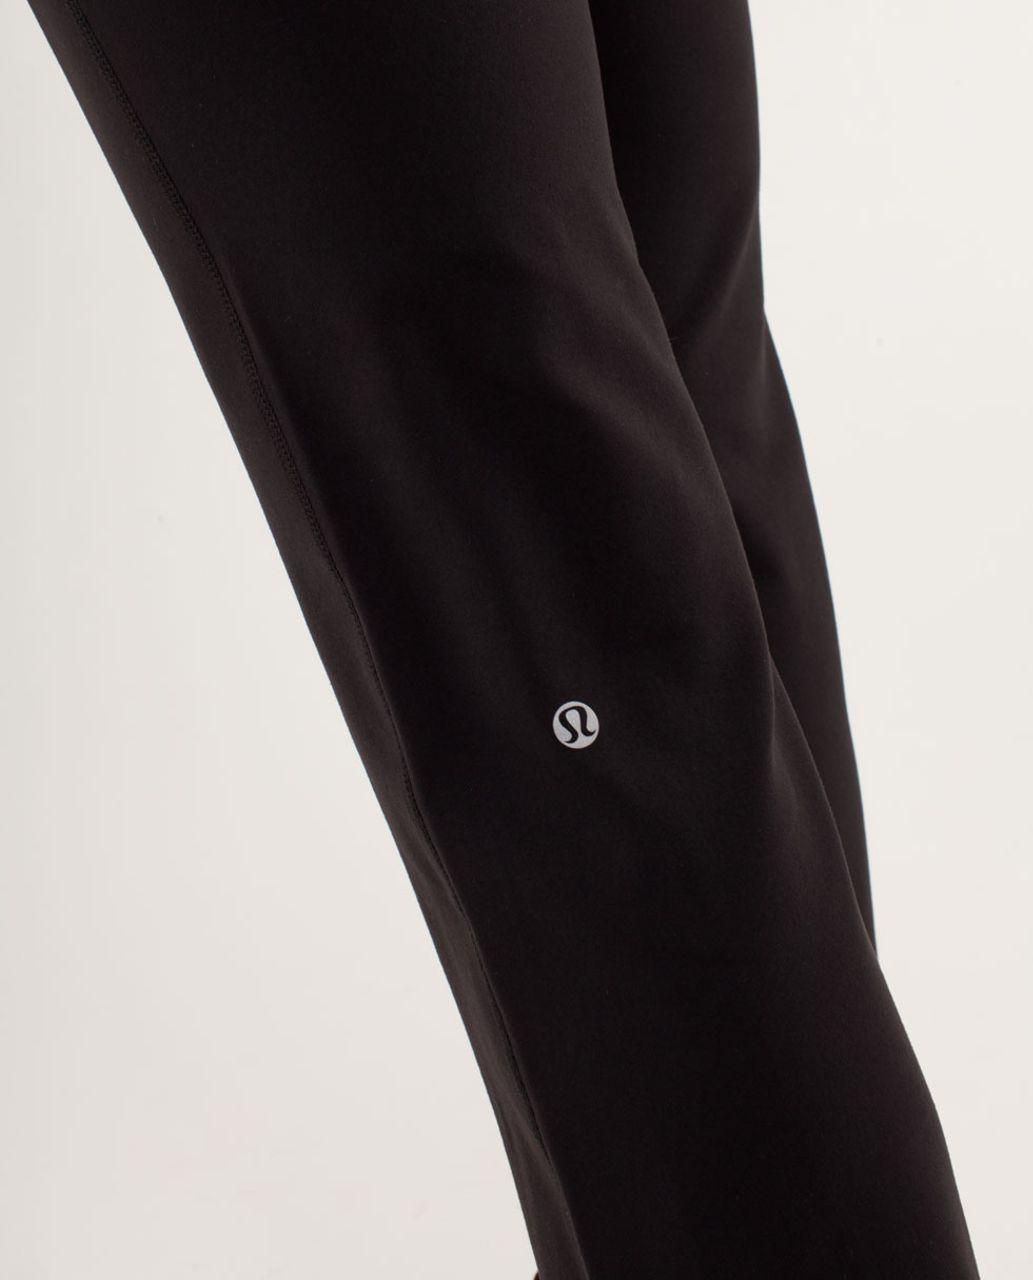 Lululemon Astro Pant (Tall) - Black / Polar Haze / Sea Stripe Polar Haze Black